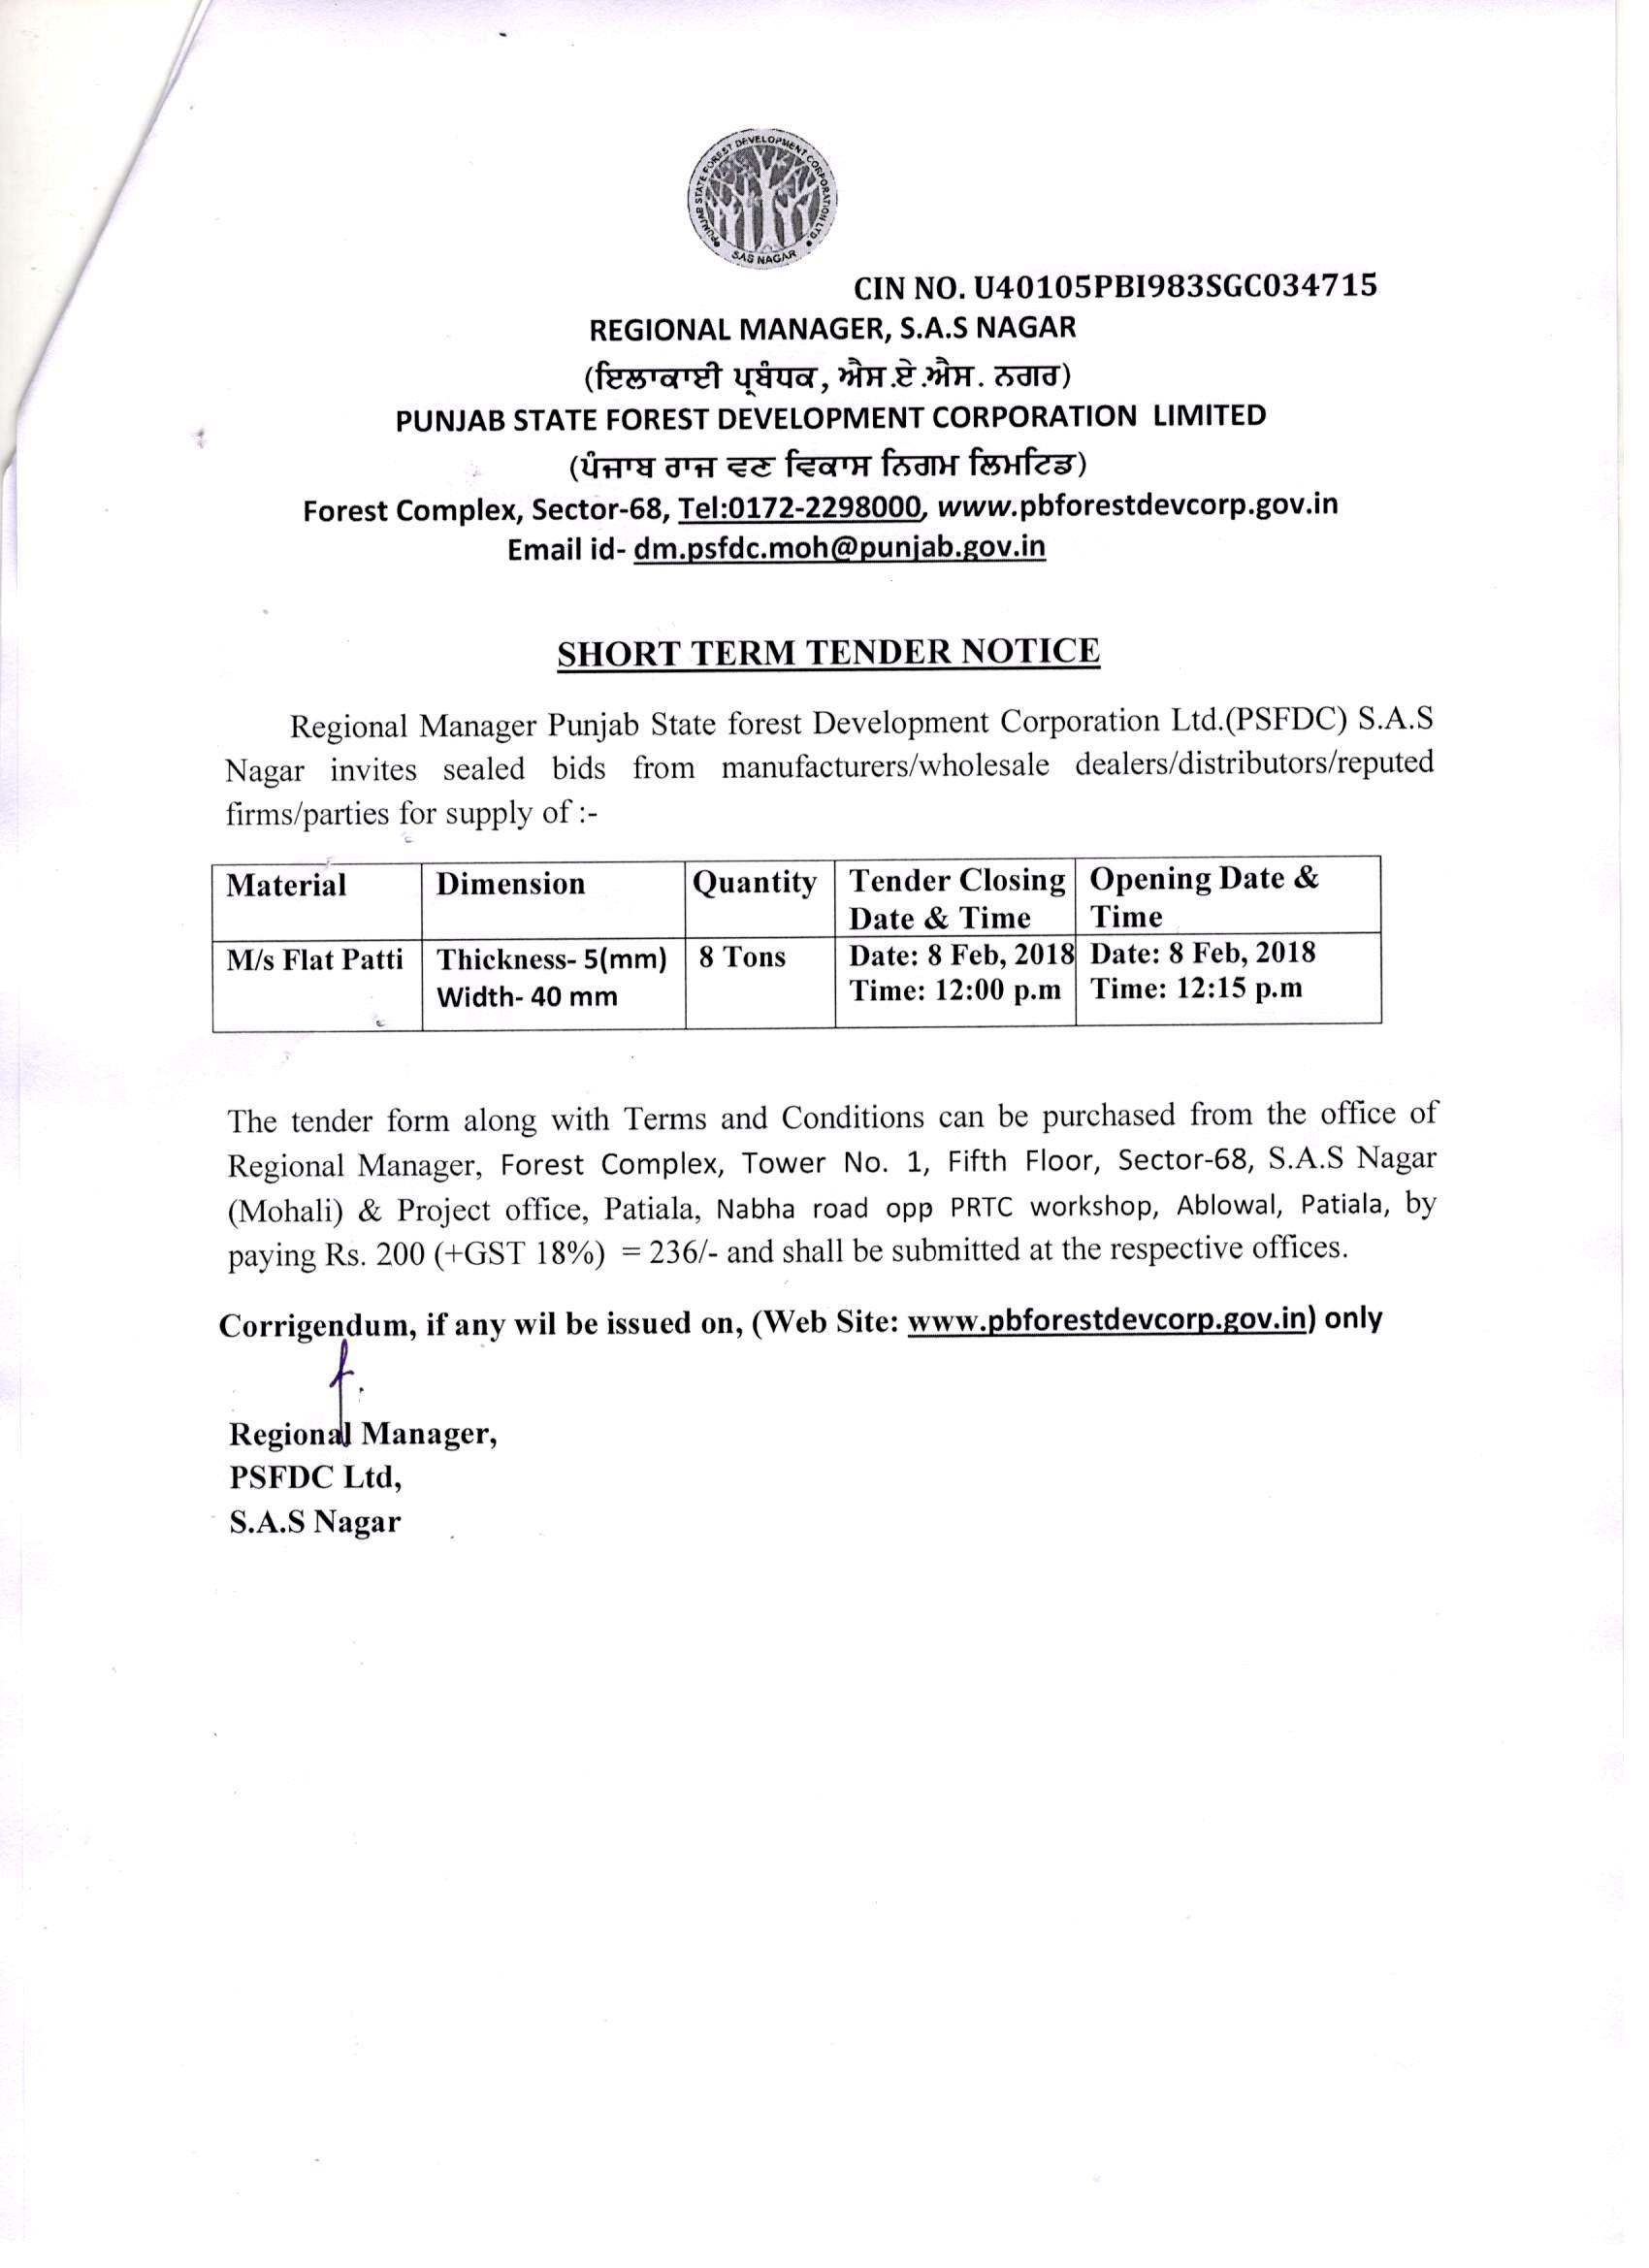 Punjab State Forest Development Corporation Ltd